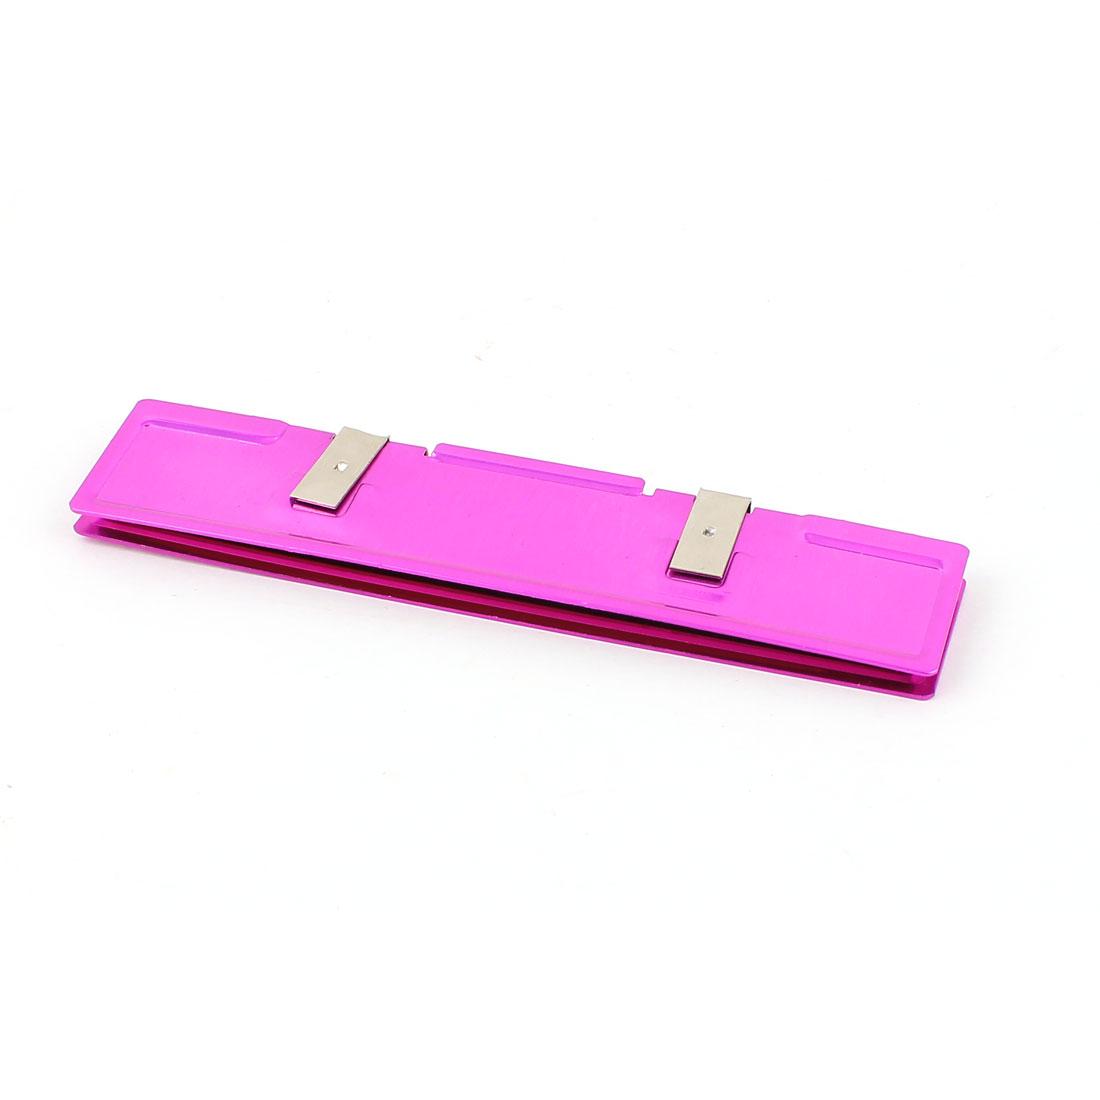 Aluminium Heatsink Spreader Cooler Cooling Pink for DDR DDR2 DDR3 RAM Memory